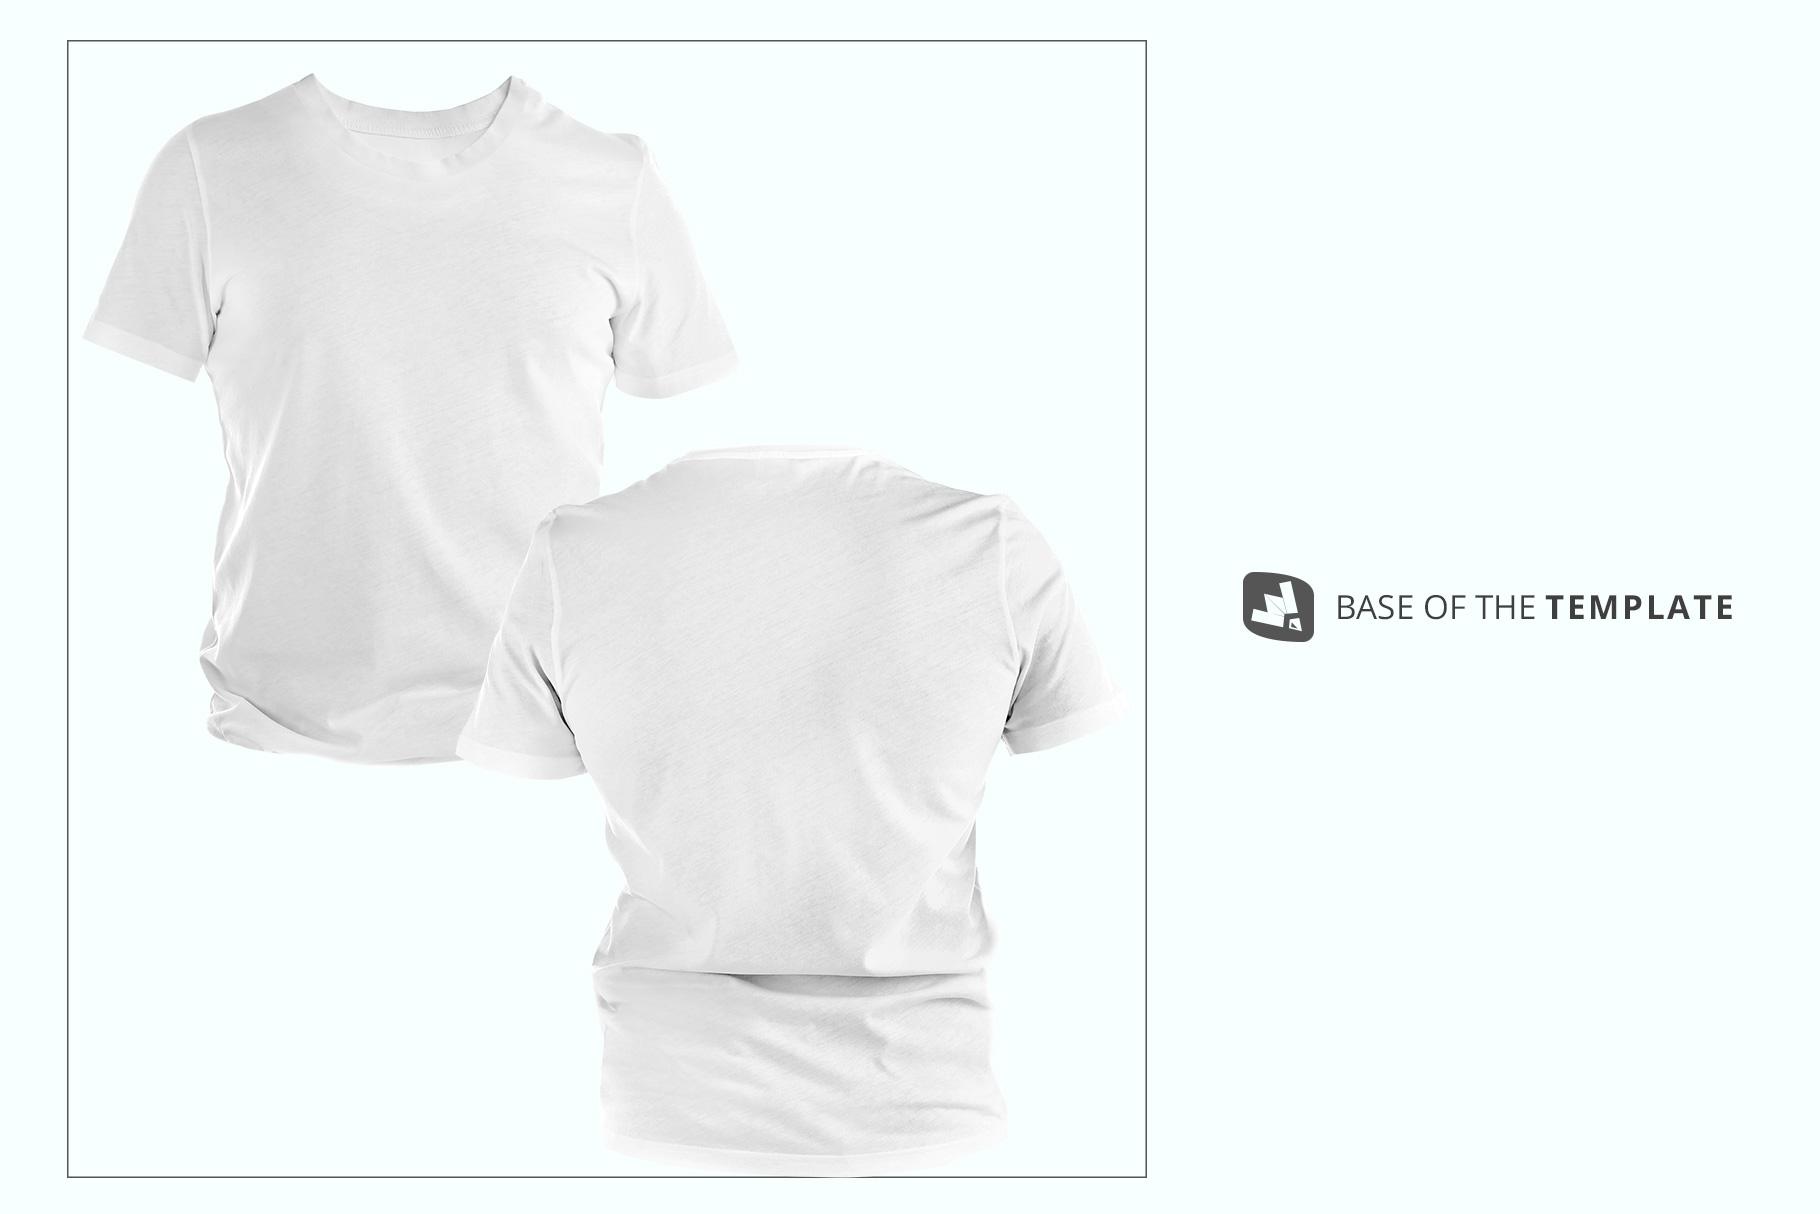 base image of the men's round collar tshirt mockup